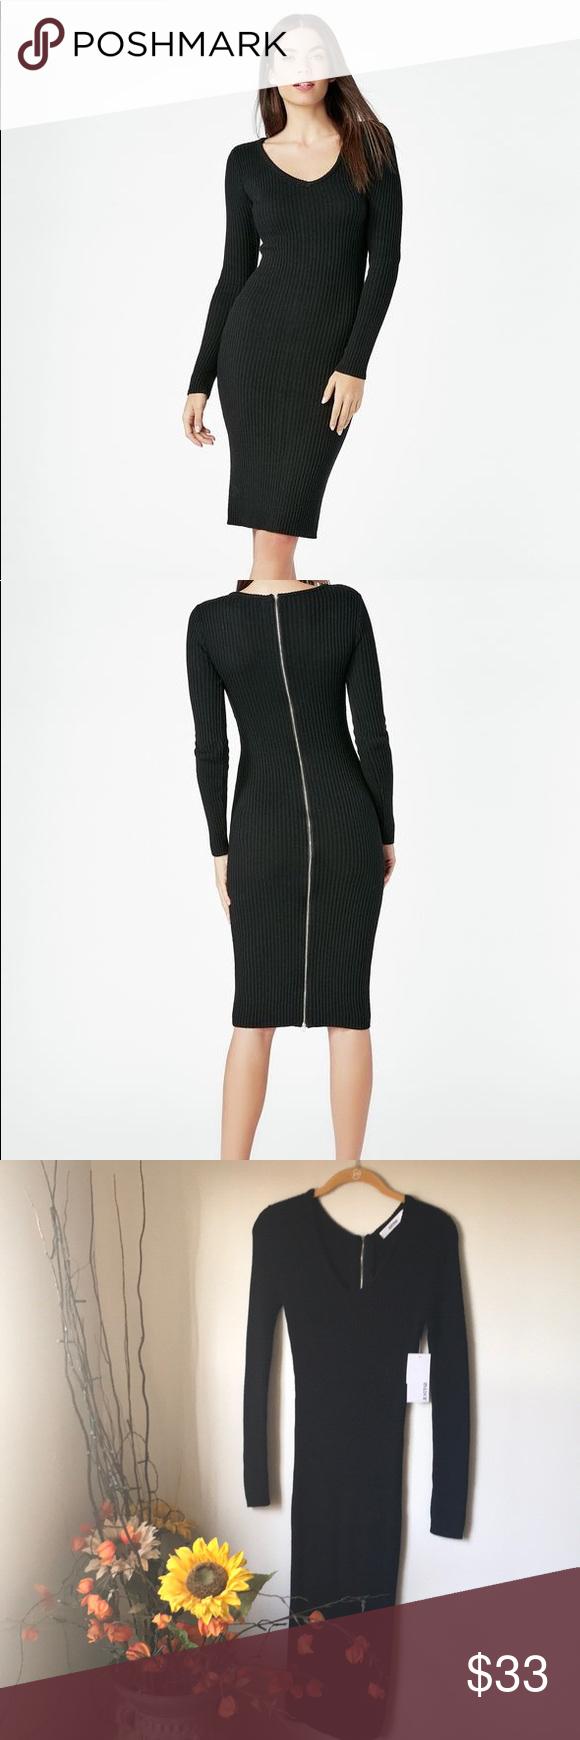 Black long sleeve bodycon zipper dress nwt black bodycon dress